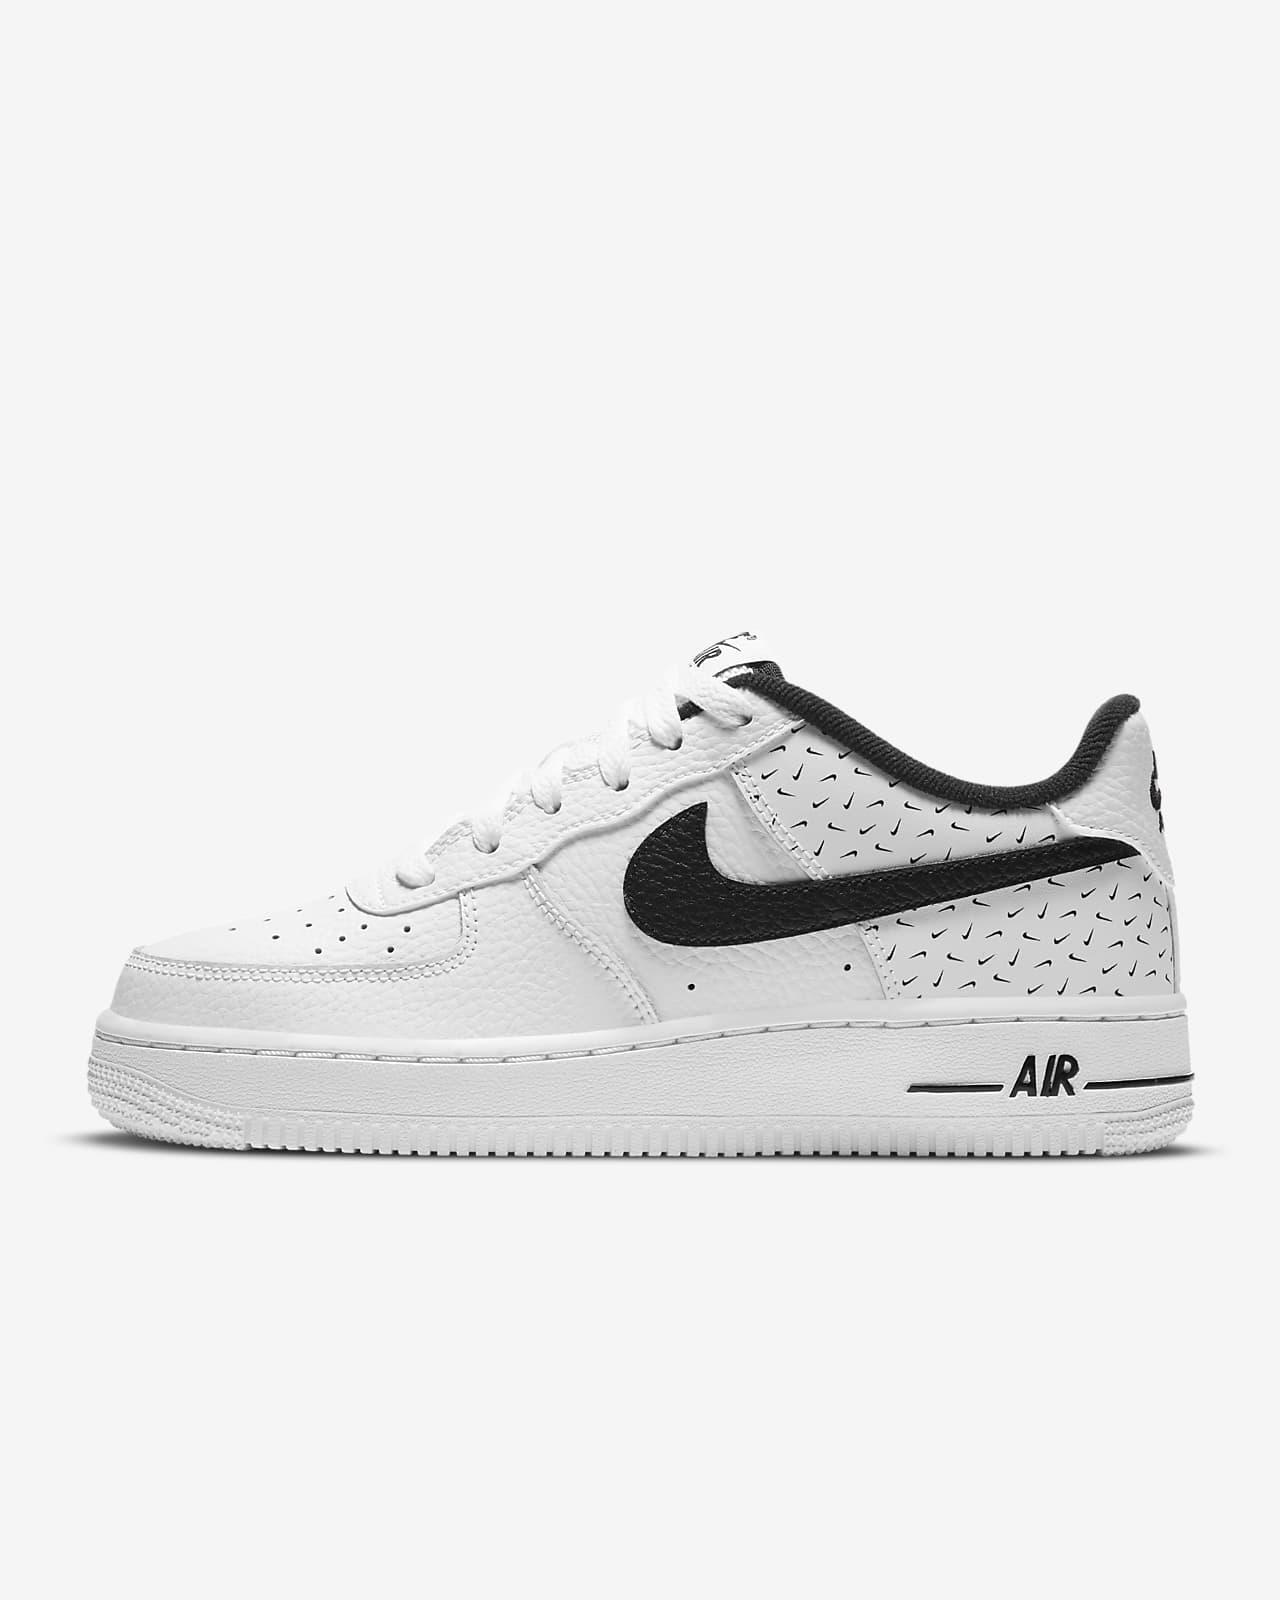 Nike Air Force 1 '07 Big Kids' Shoe